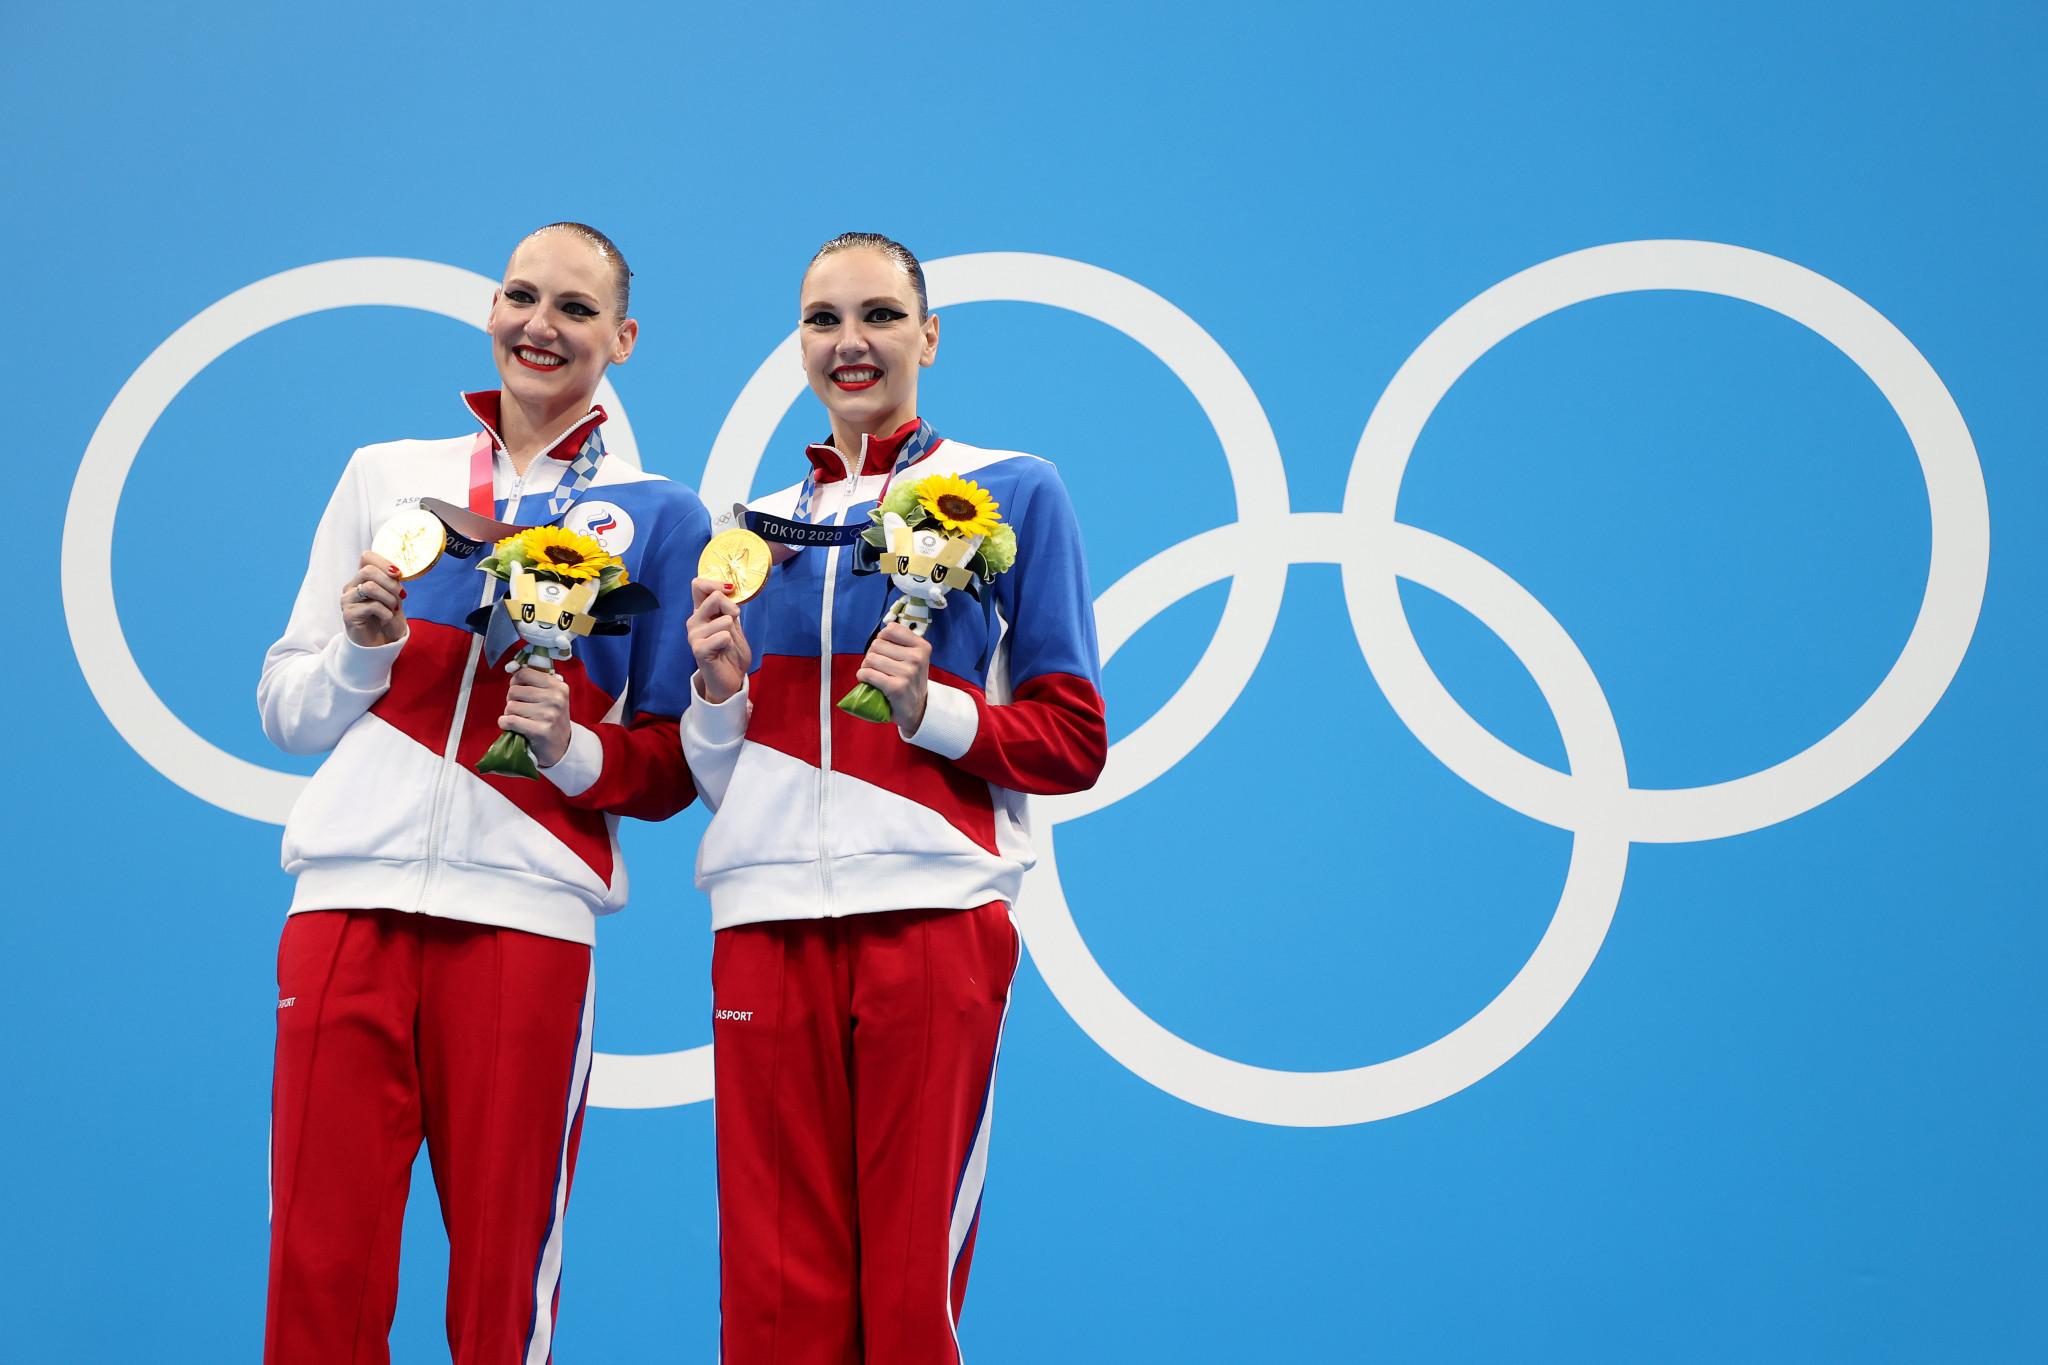 Svetlana Kolesnichenko and Svetlana Romashina also won gold in the artistic swimming duet discipline at Tokyo 2020 ©Getty Images